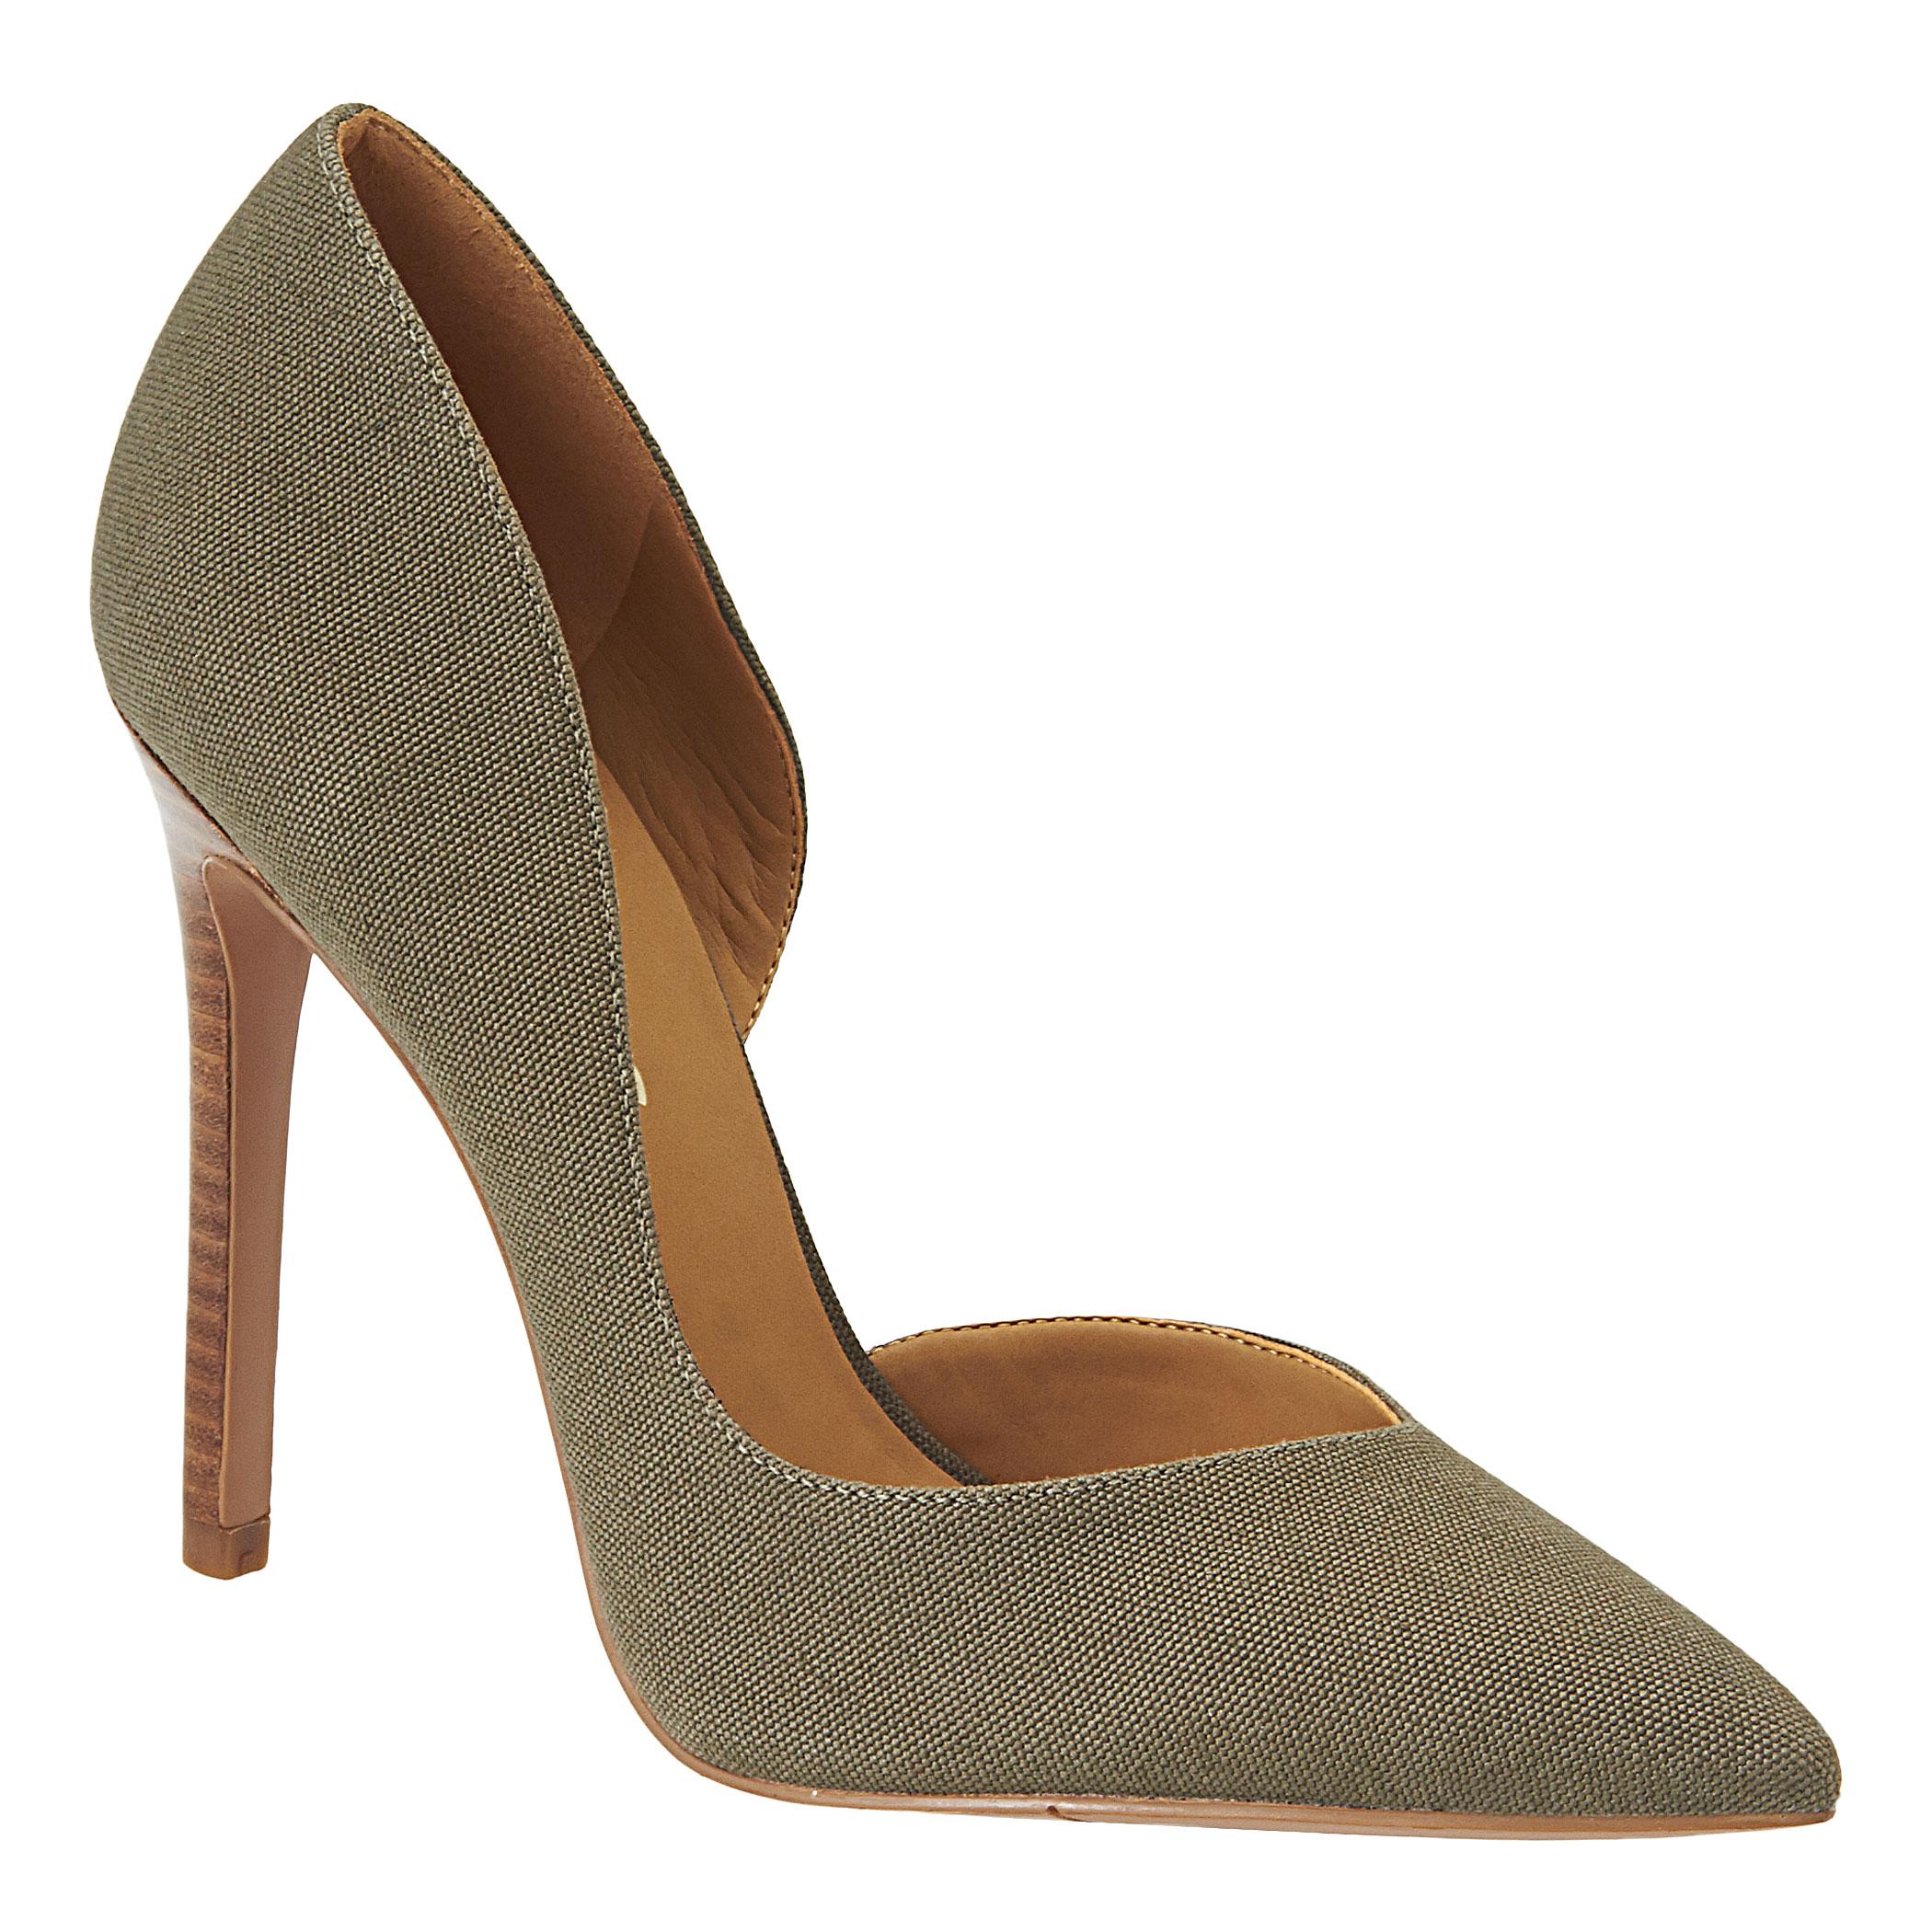 Shoes > All Pumps > Gamin d'Orsay High Heels